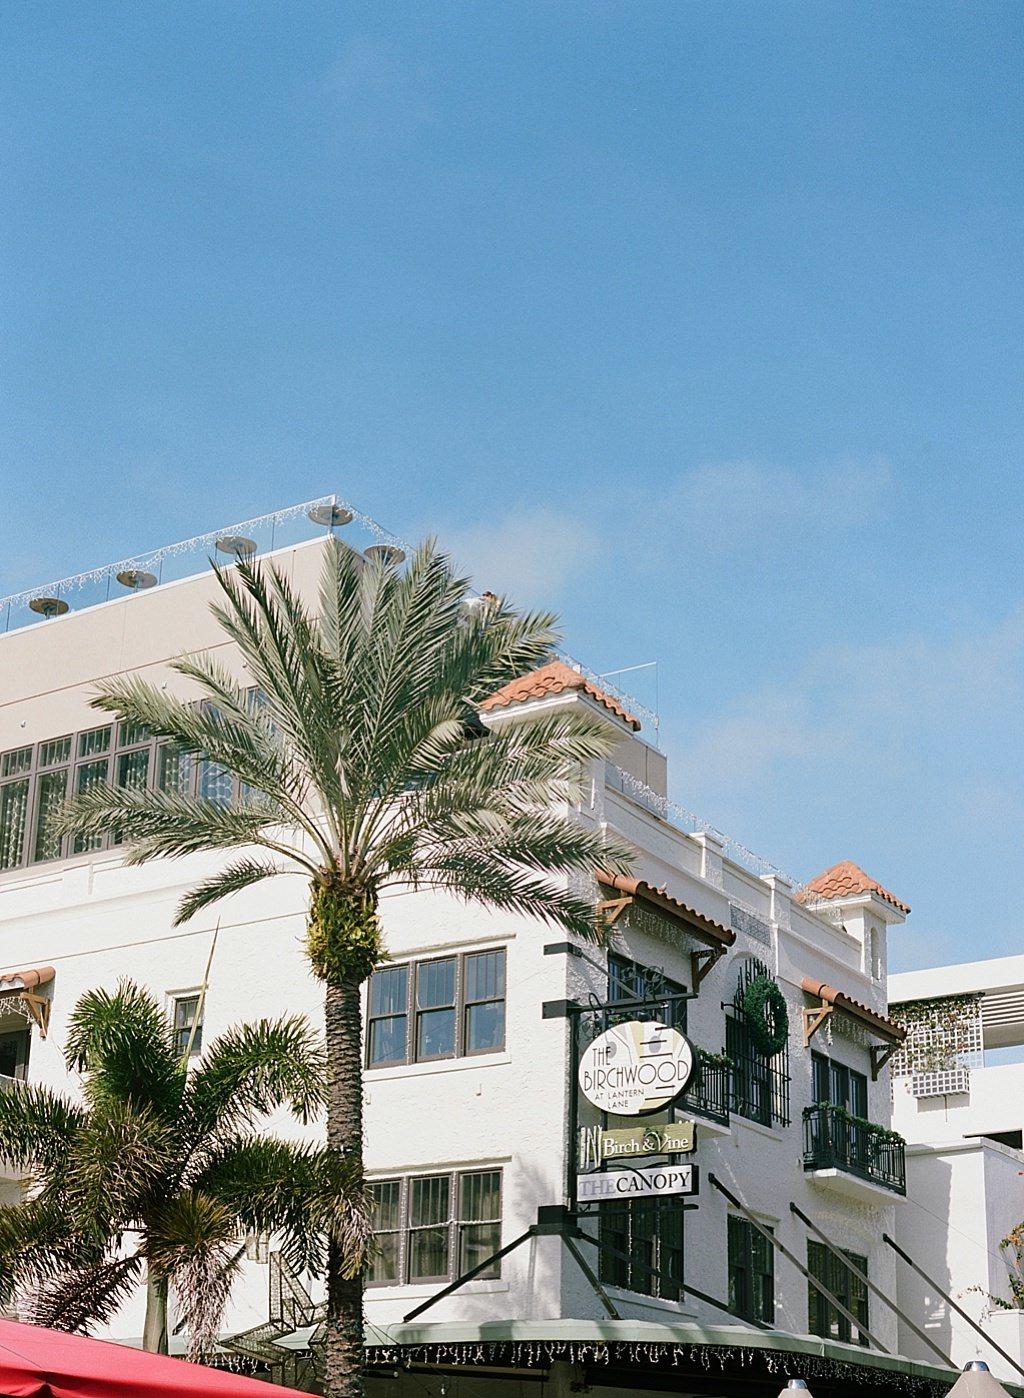 Downtown St. Pete Boutique Hotel Wedding Venue The Birchwood